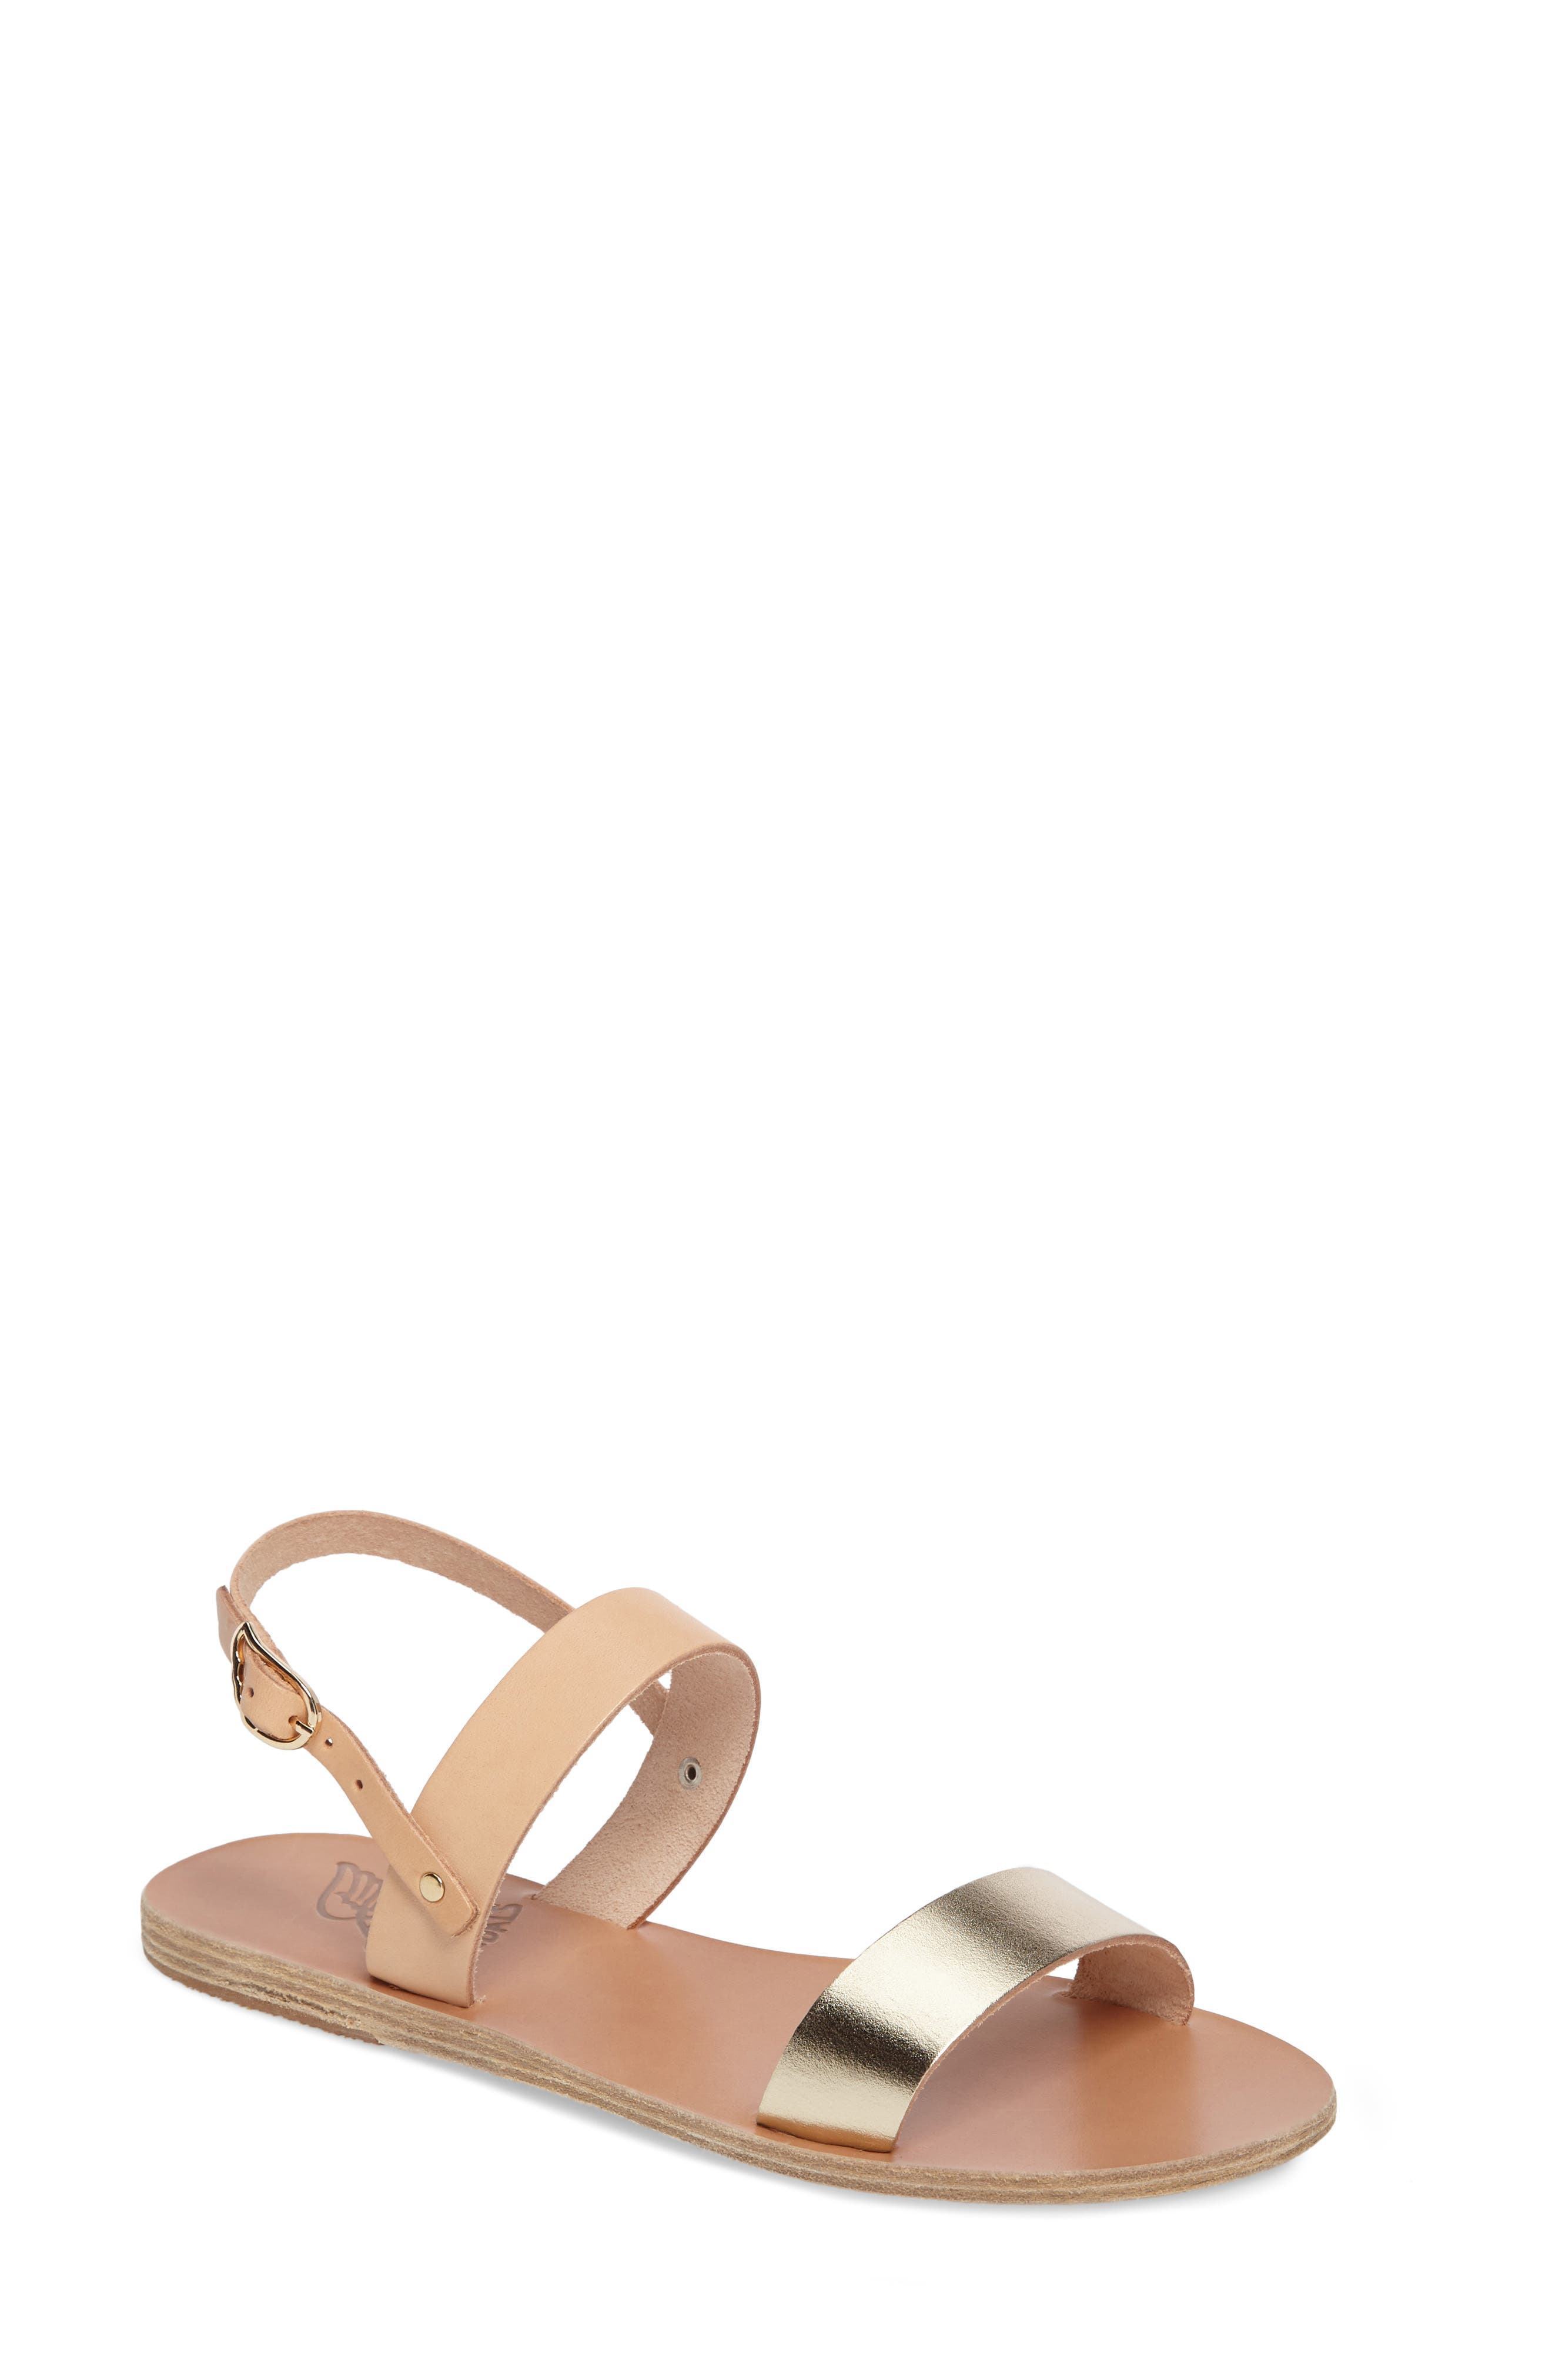 ANCIENT GREEK SANDALS Clio Slingback Sandal